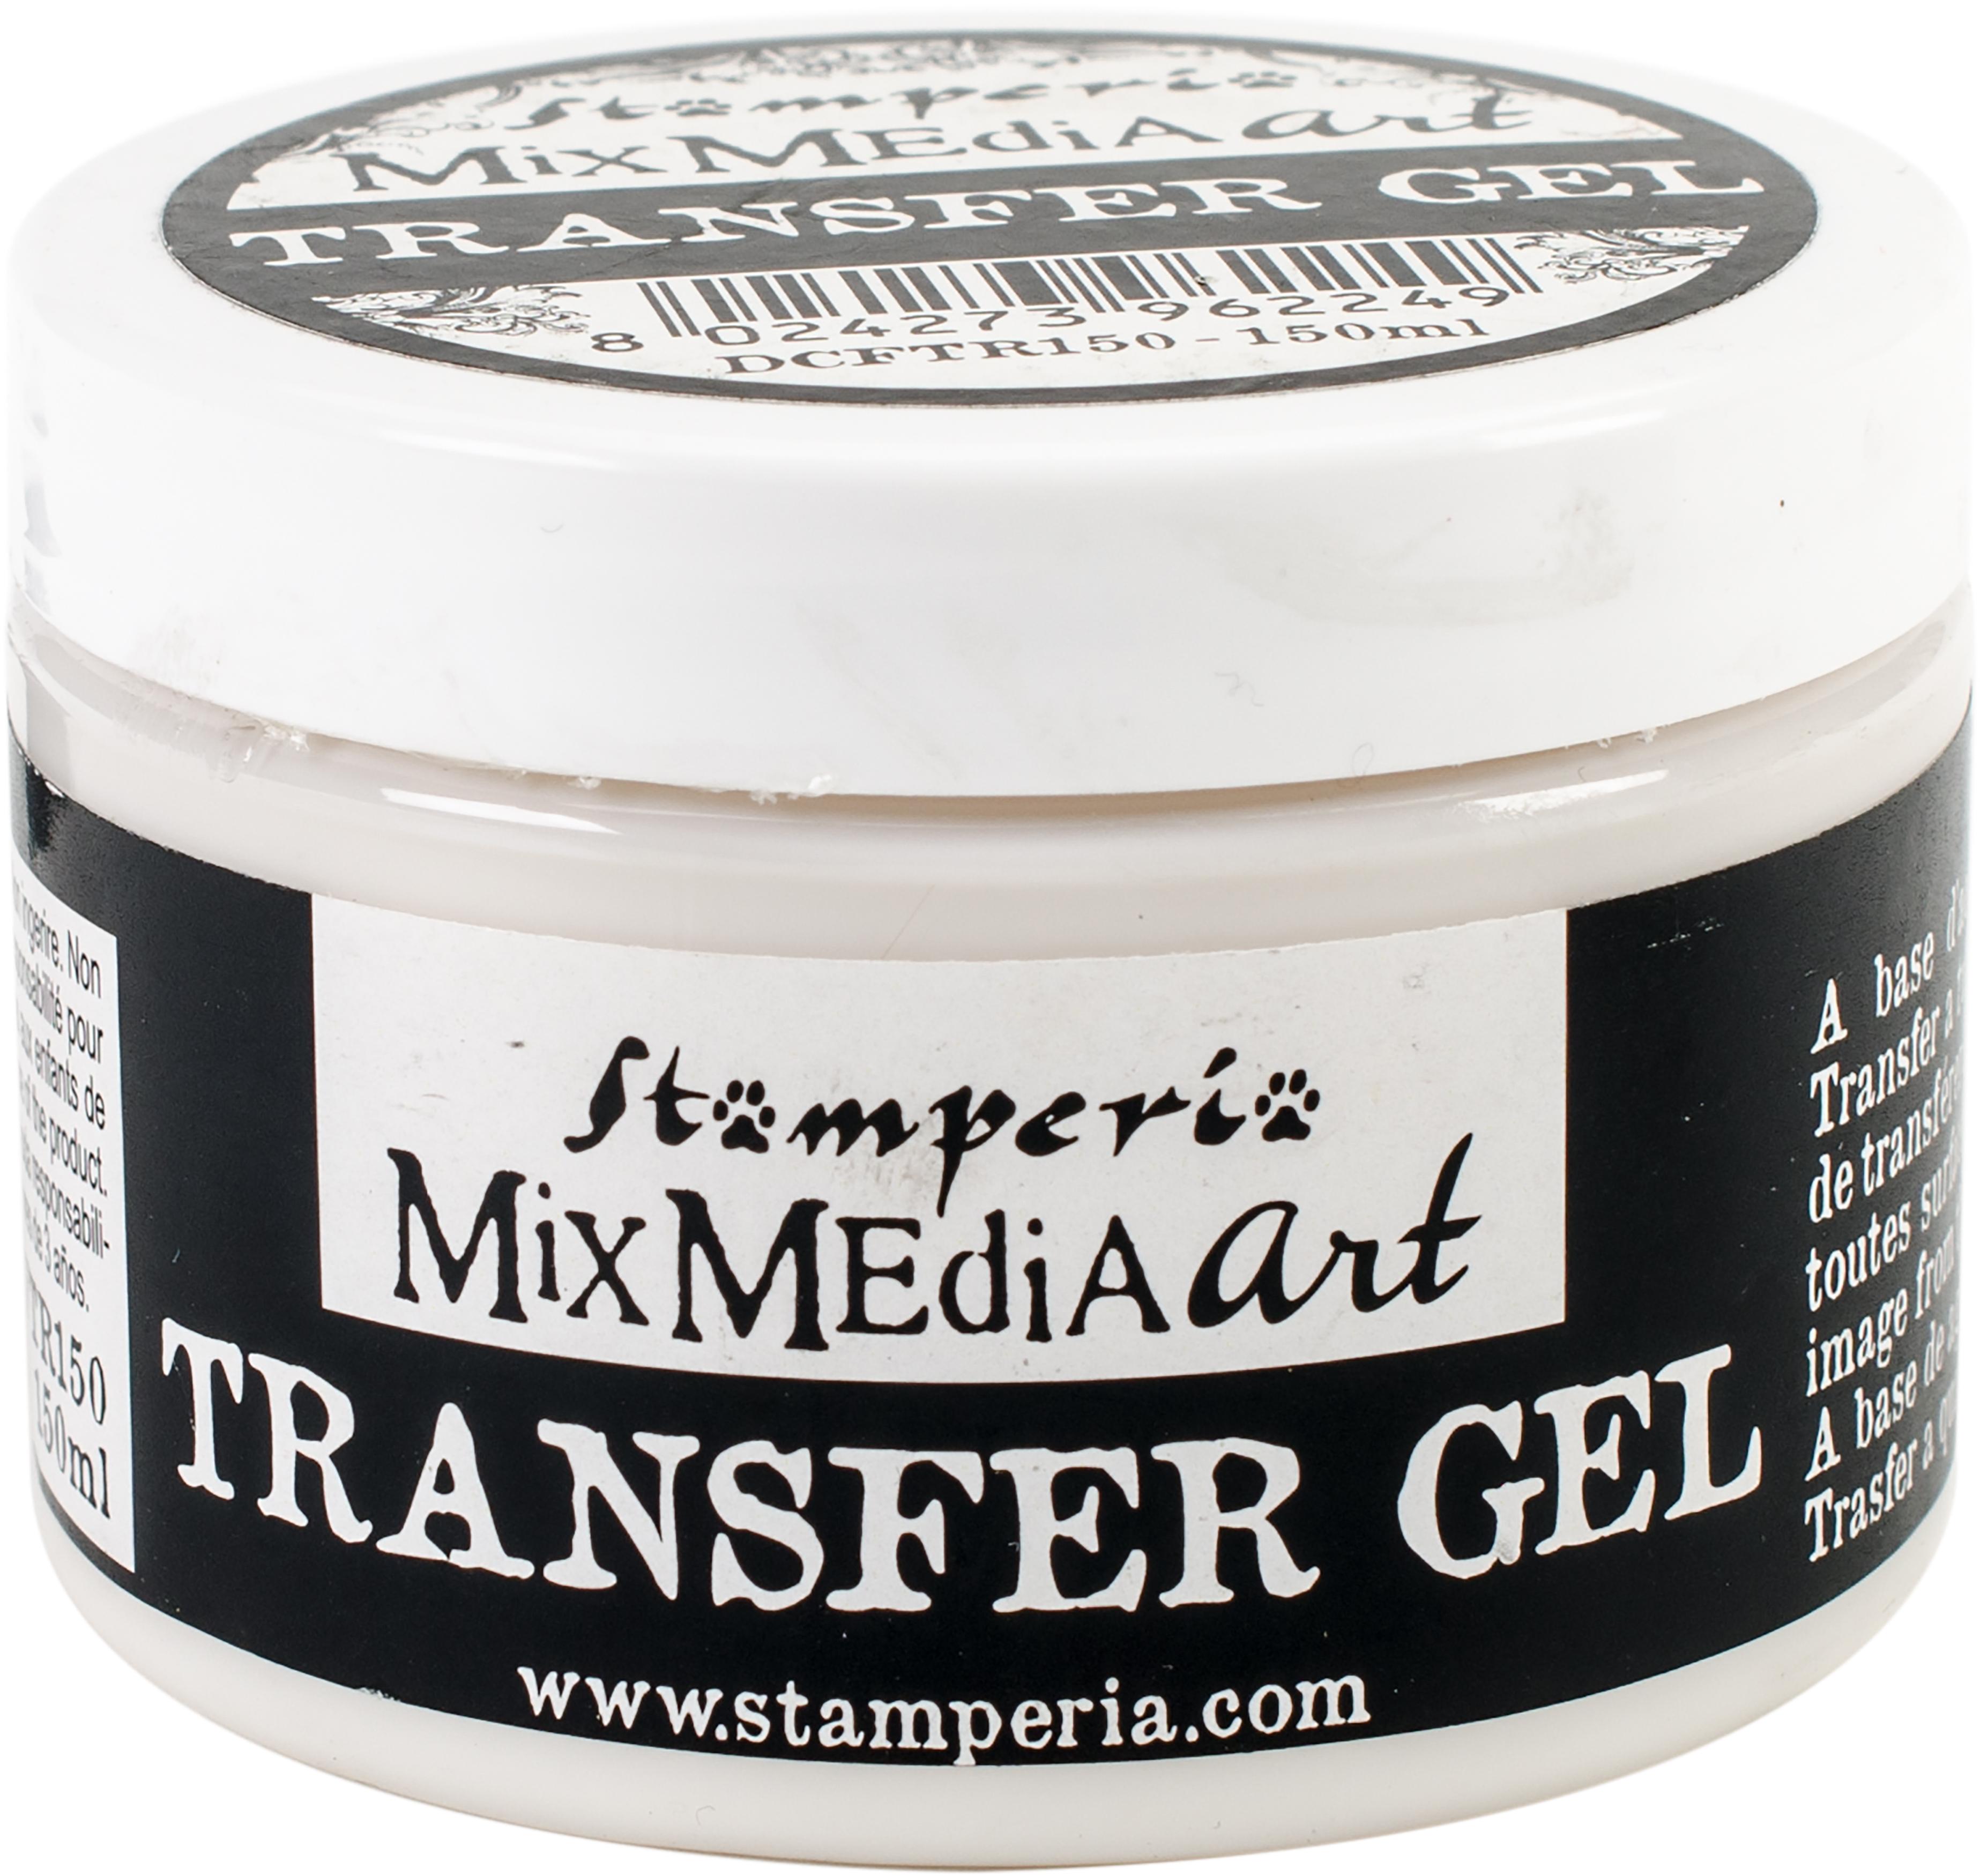 Stamperia Transfer Gel